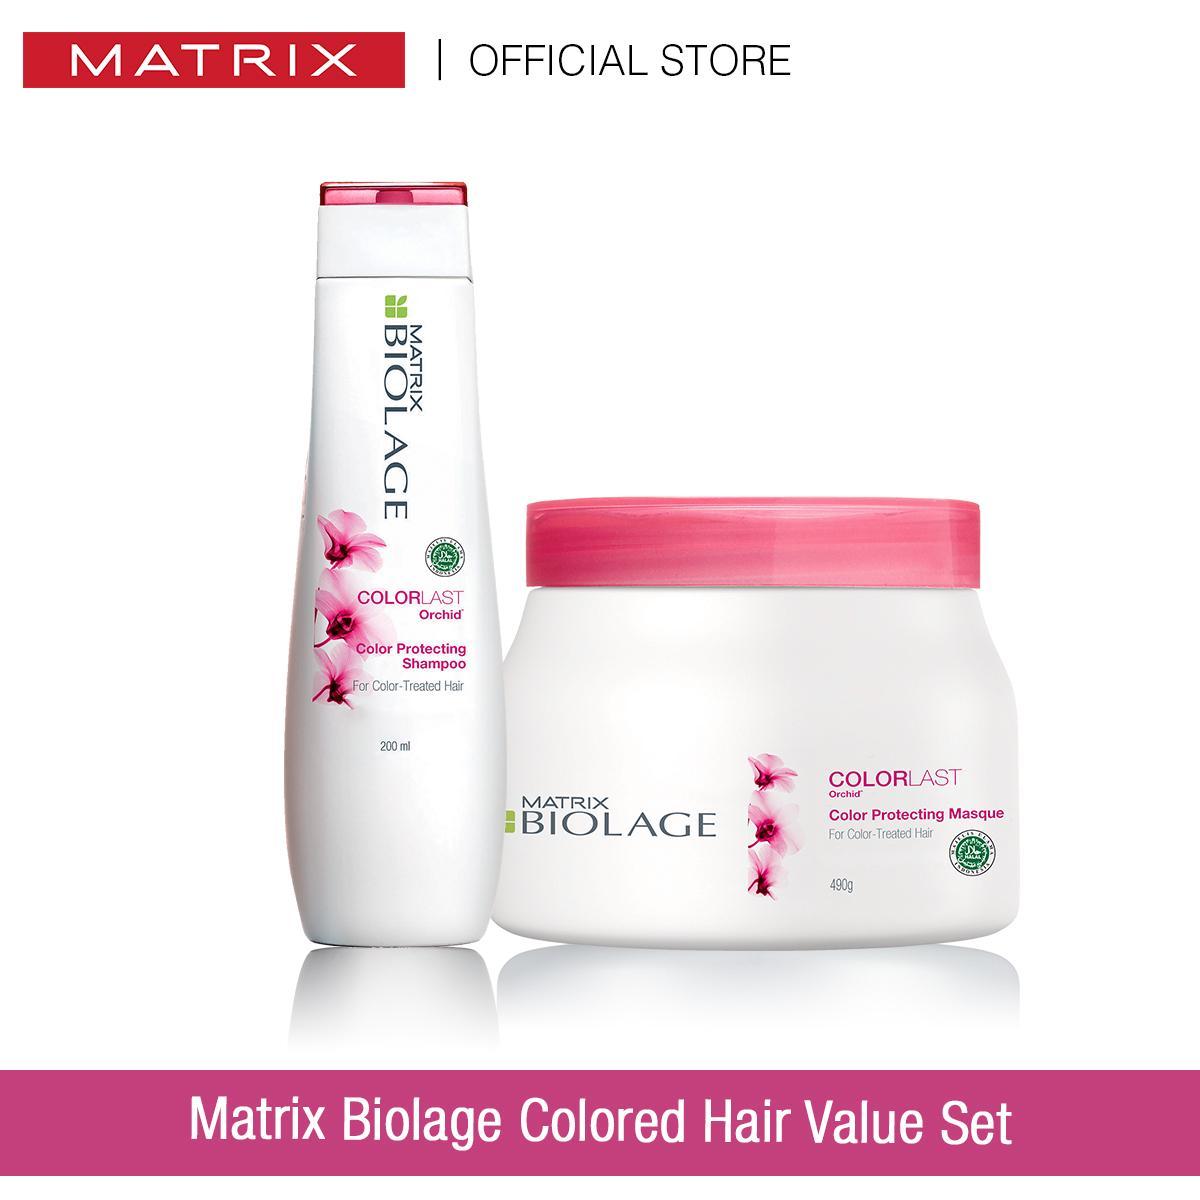 Matrix Biolage Colored Hair Value Set Shopee Indonesia